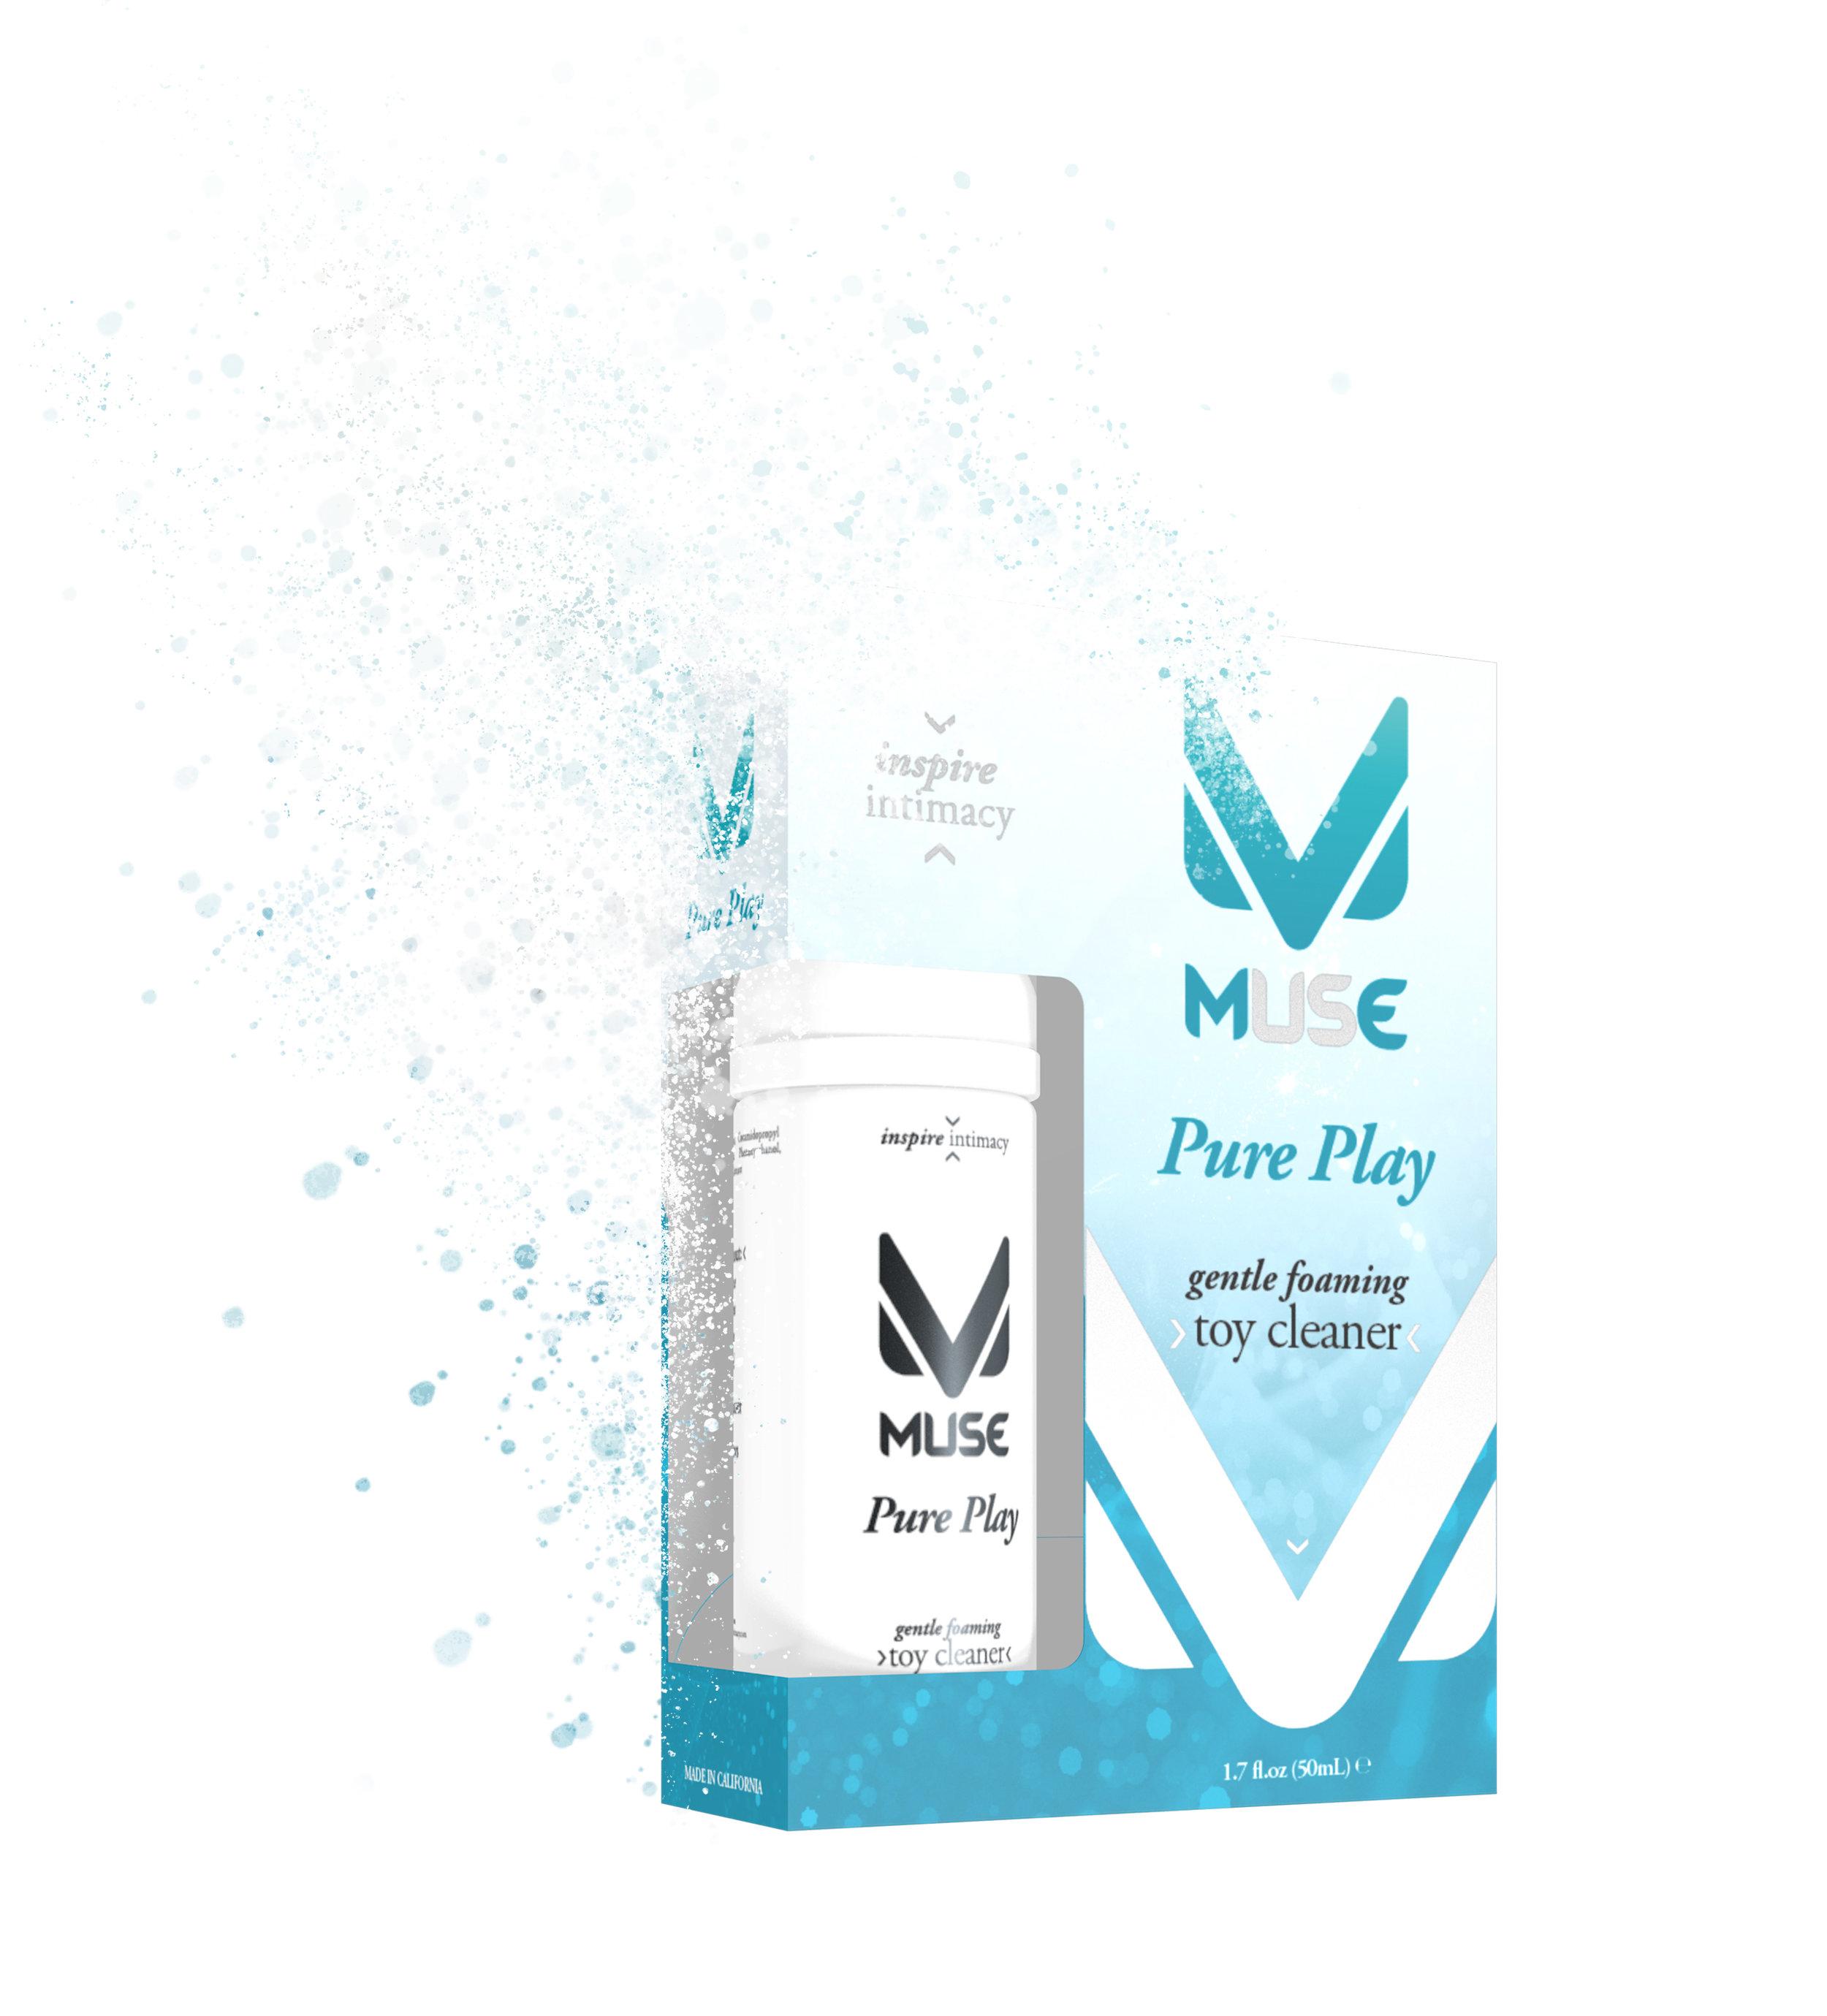 MUSE_PurePlay PAIR Particle.jpg